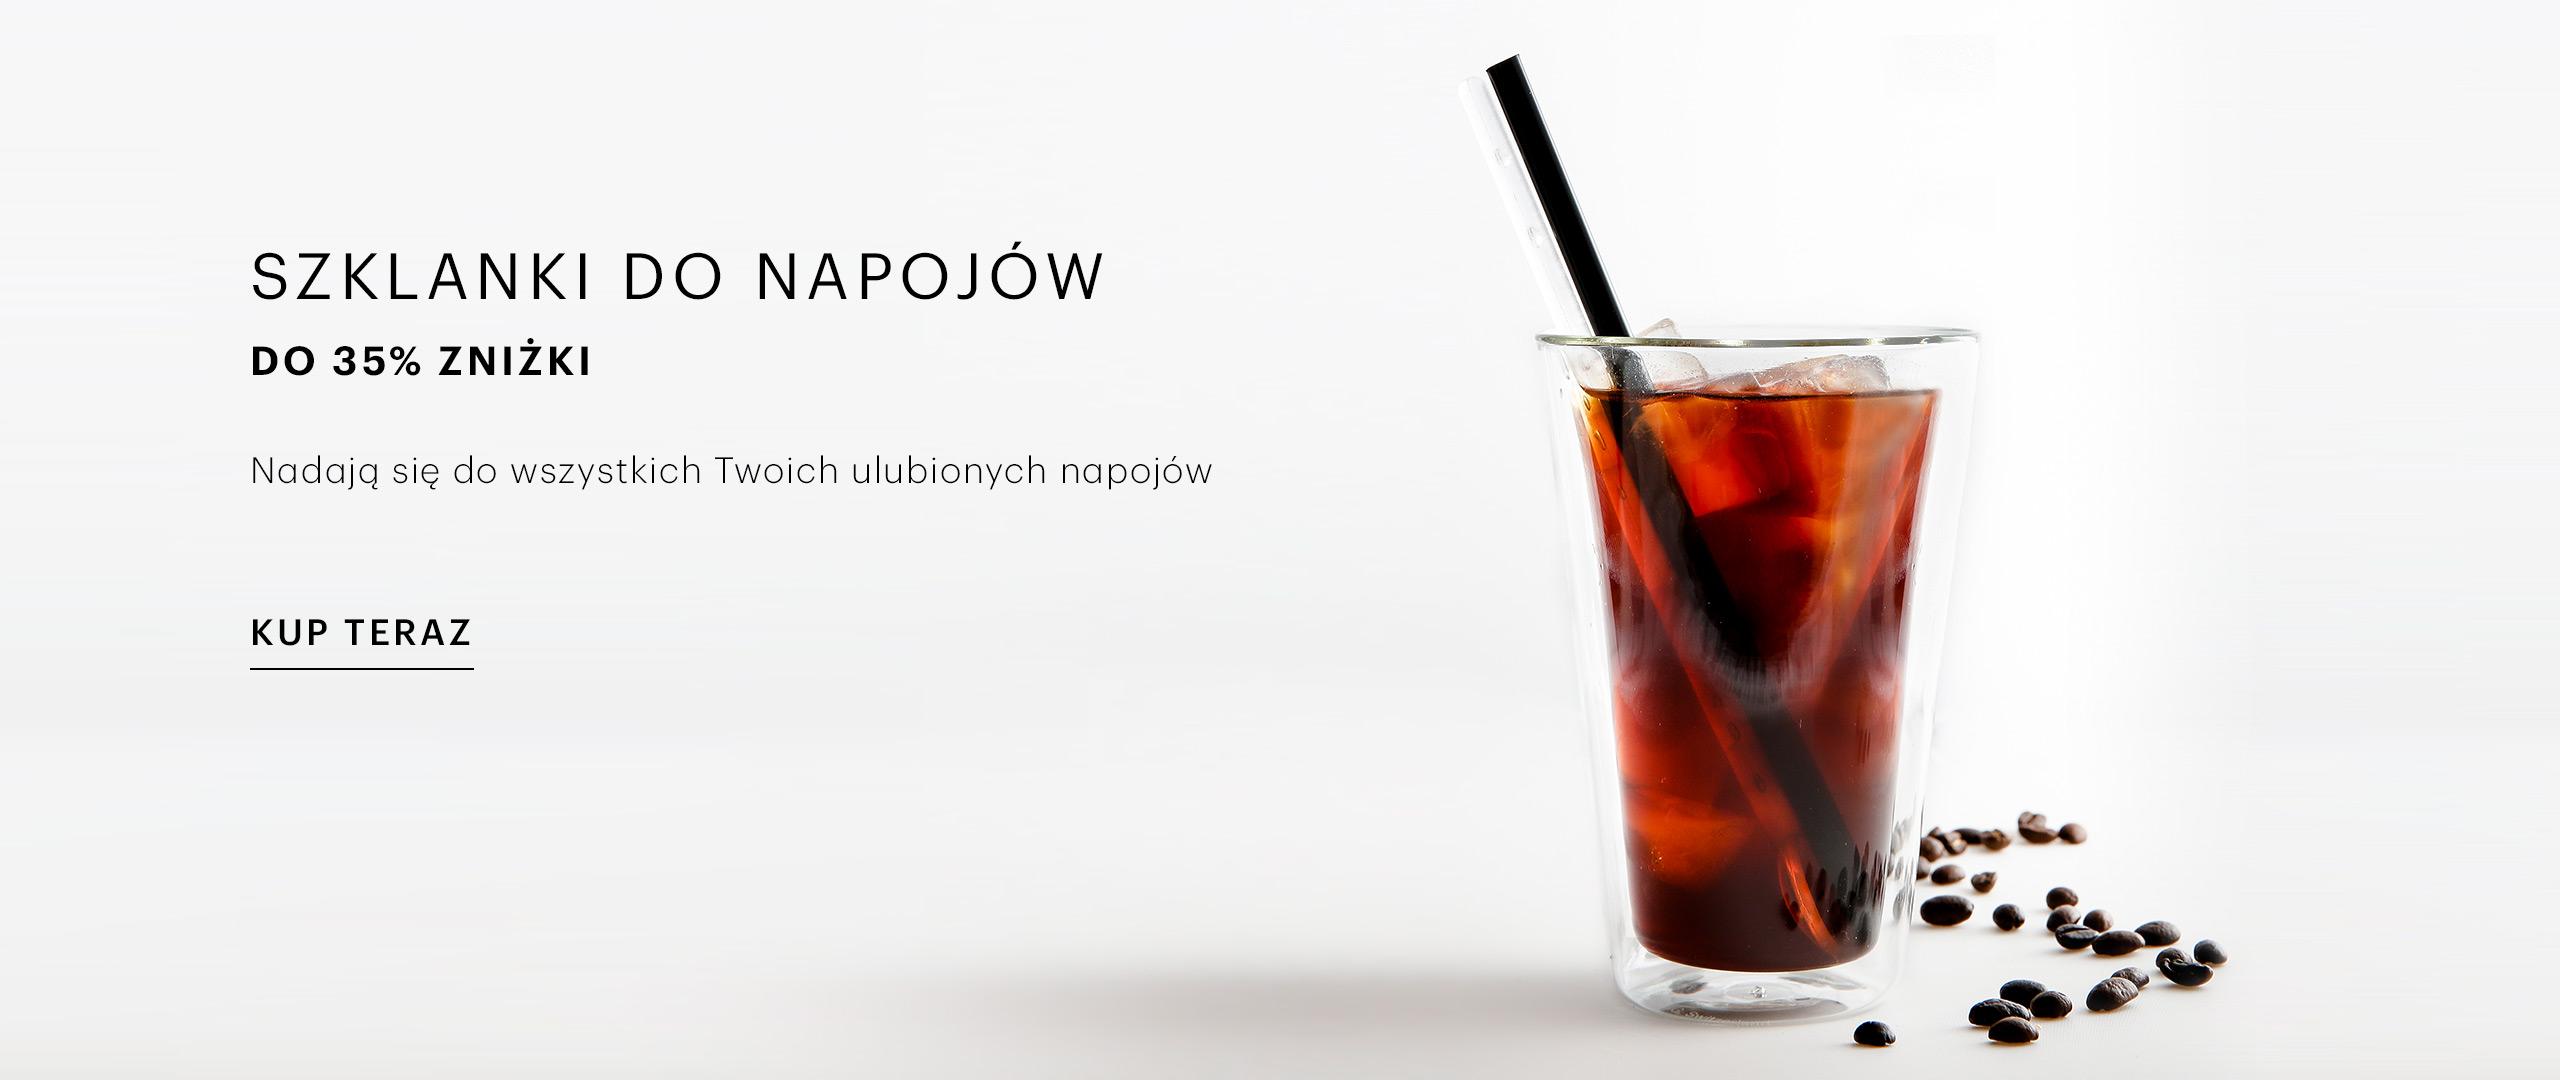 BEU [PL] - Drinkware